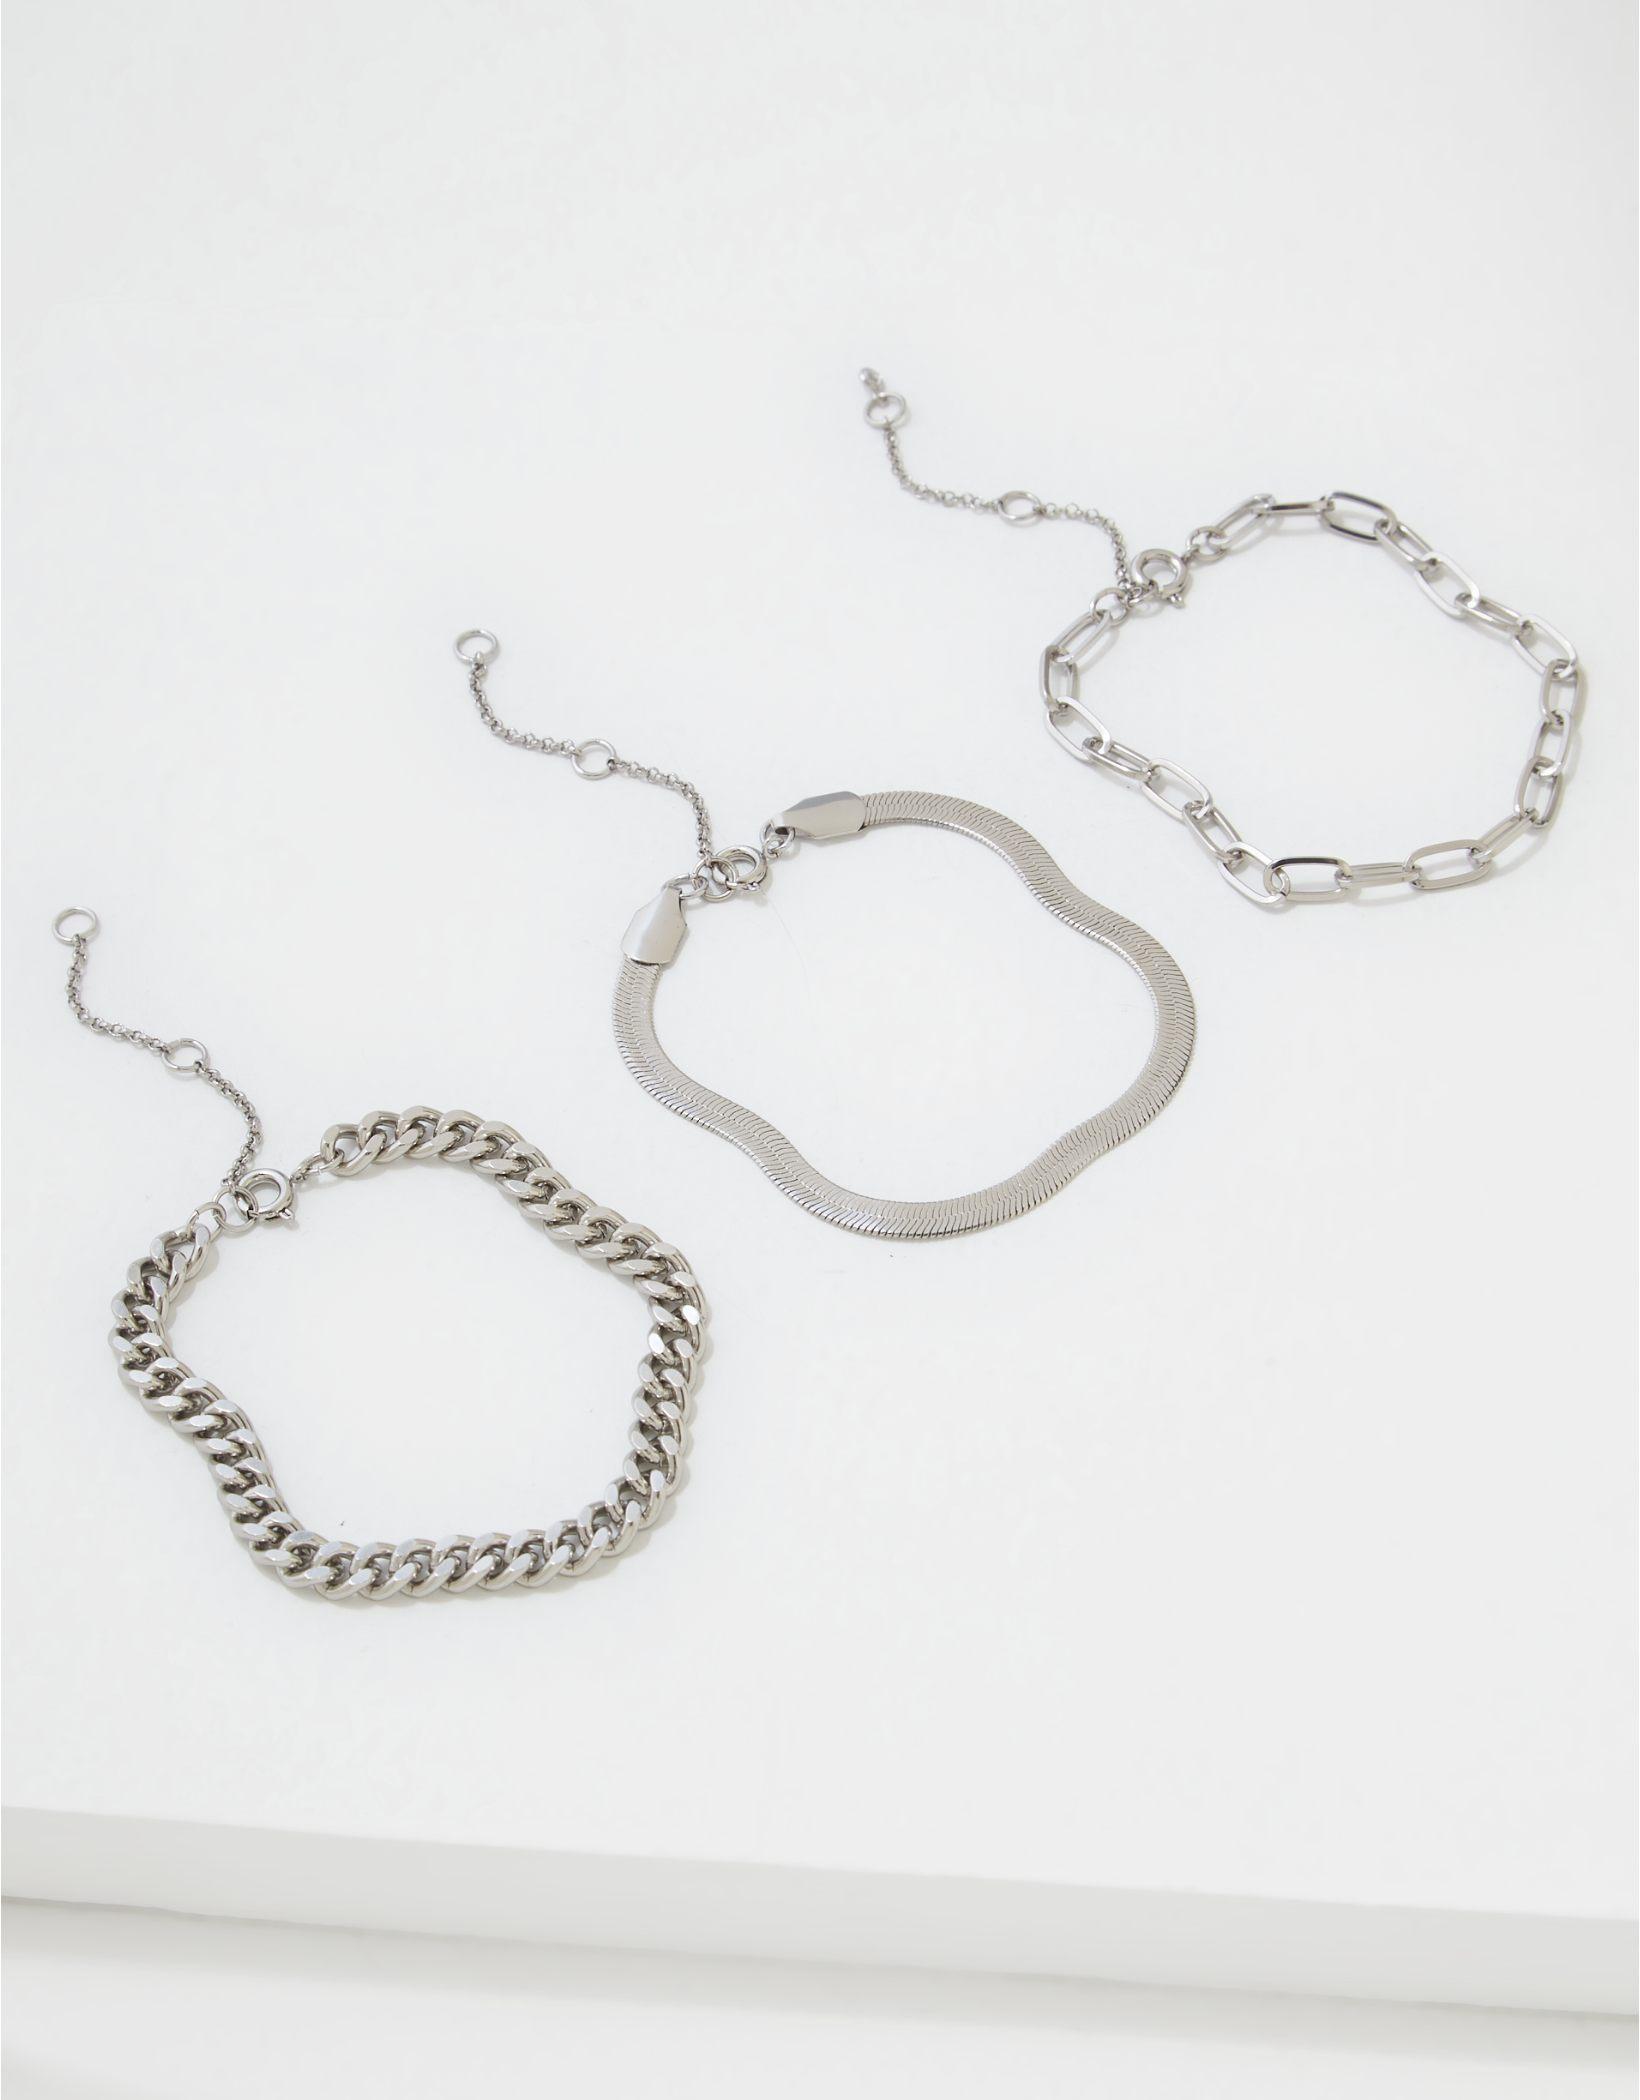 AEO Silver Chunky Chain Bracelets 3-Pack